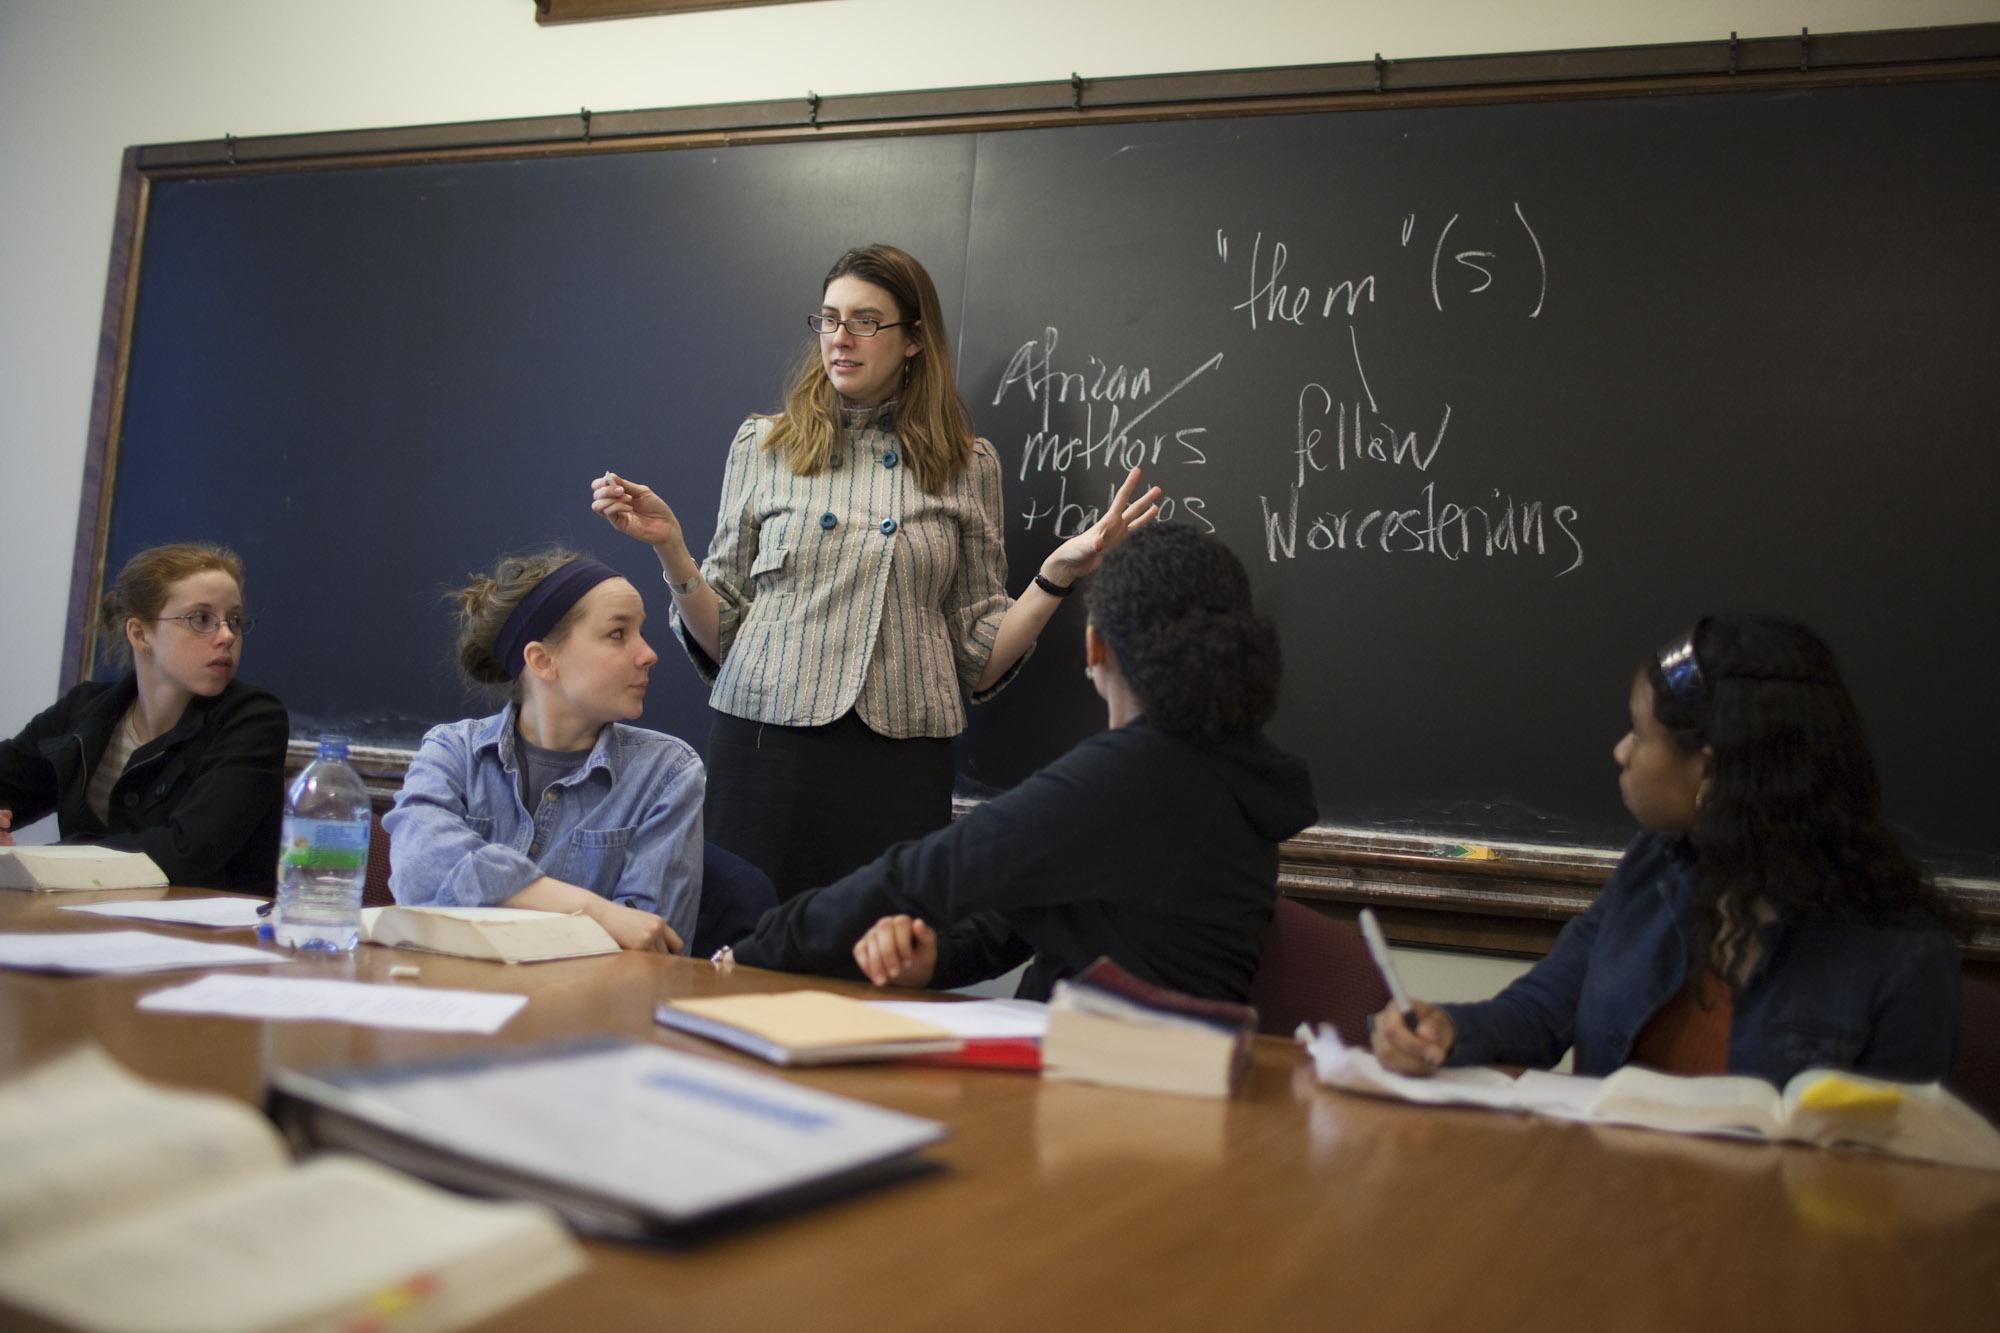 Summer Program - STEM | Wellesley Pre-College: Honors Immersion